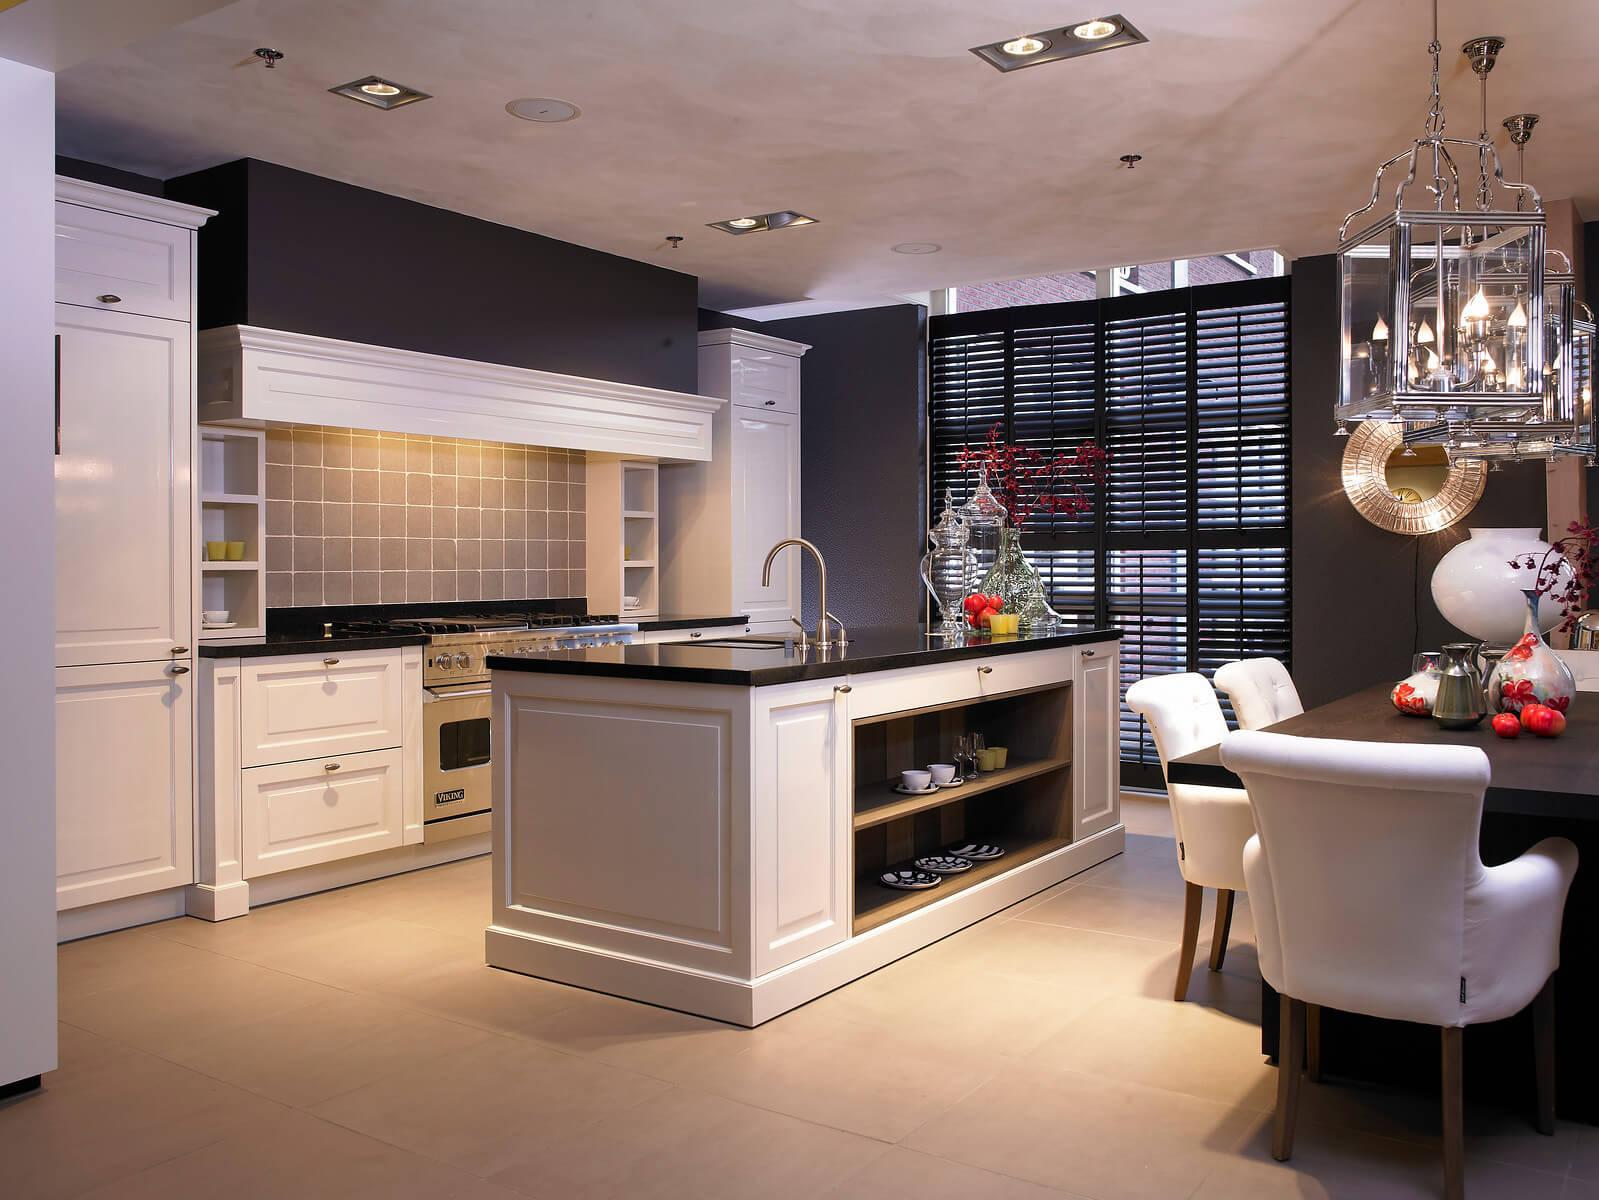 Witte landeljke keuken met grijze tegels